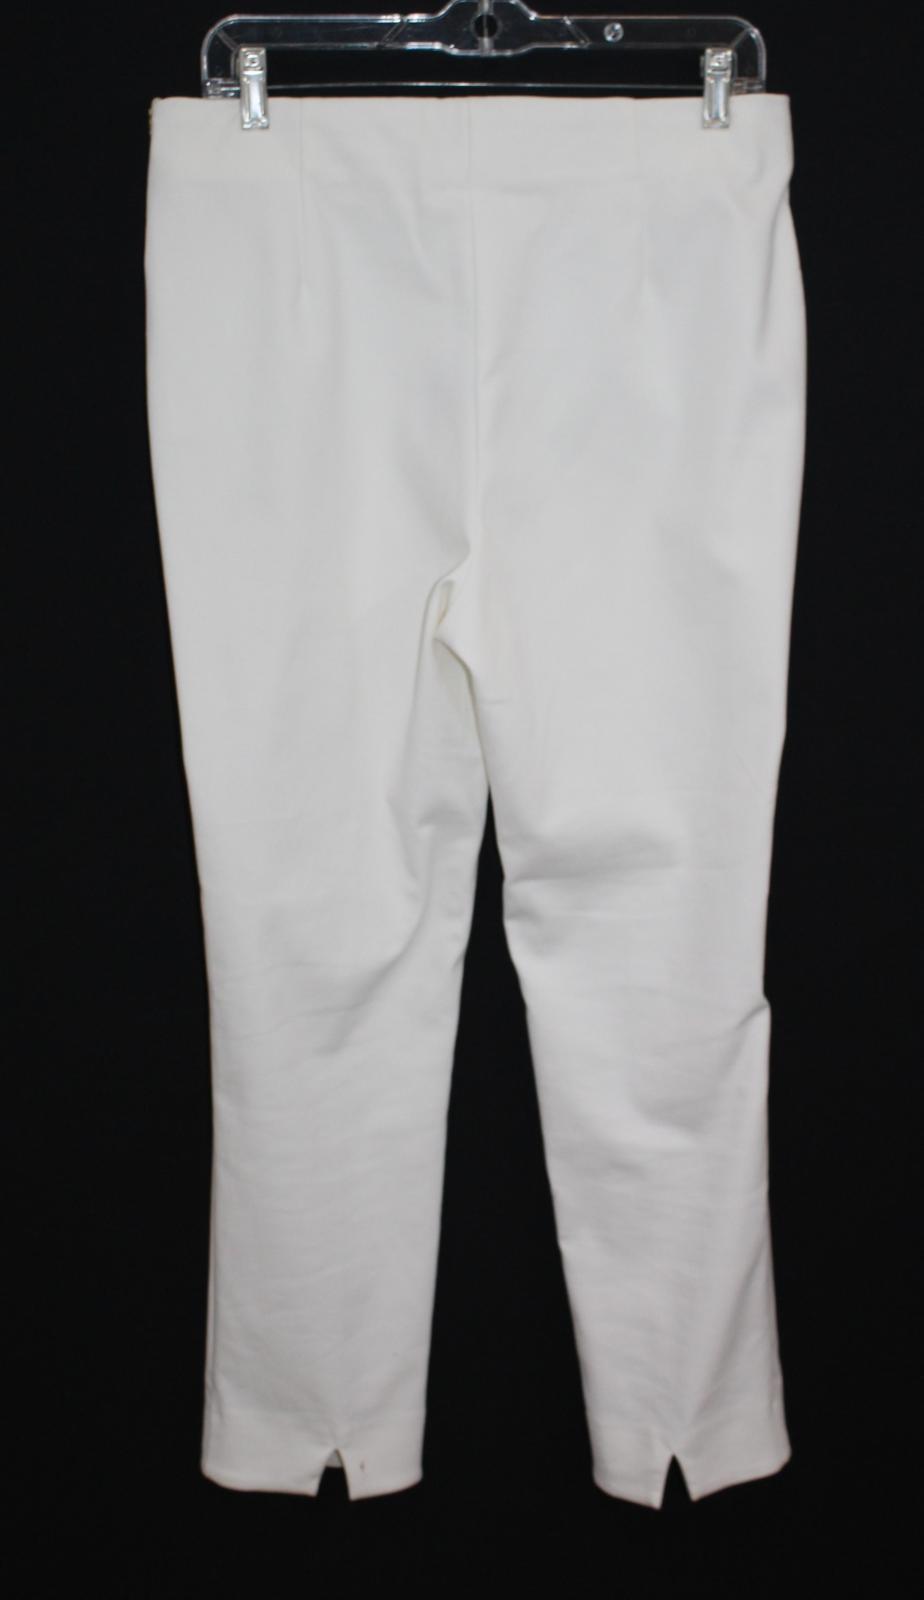 Costa-Damas-Marfil-Alexa-Algodon-Mezcla-recortada-High-rise-Pantalones-Cremallera-Lateral-UK14 miniatura 12